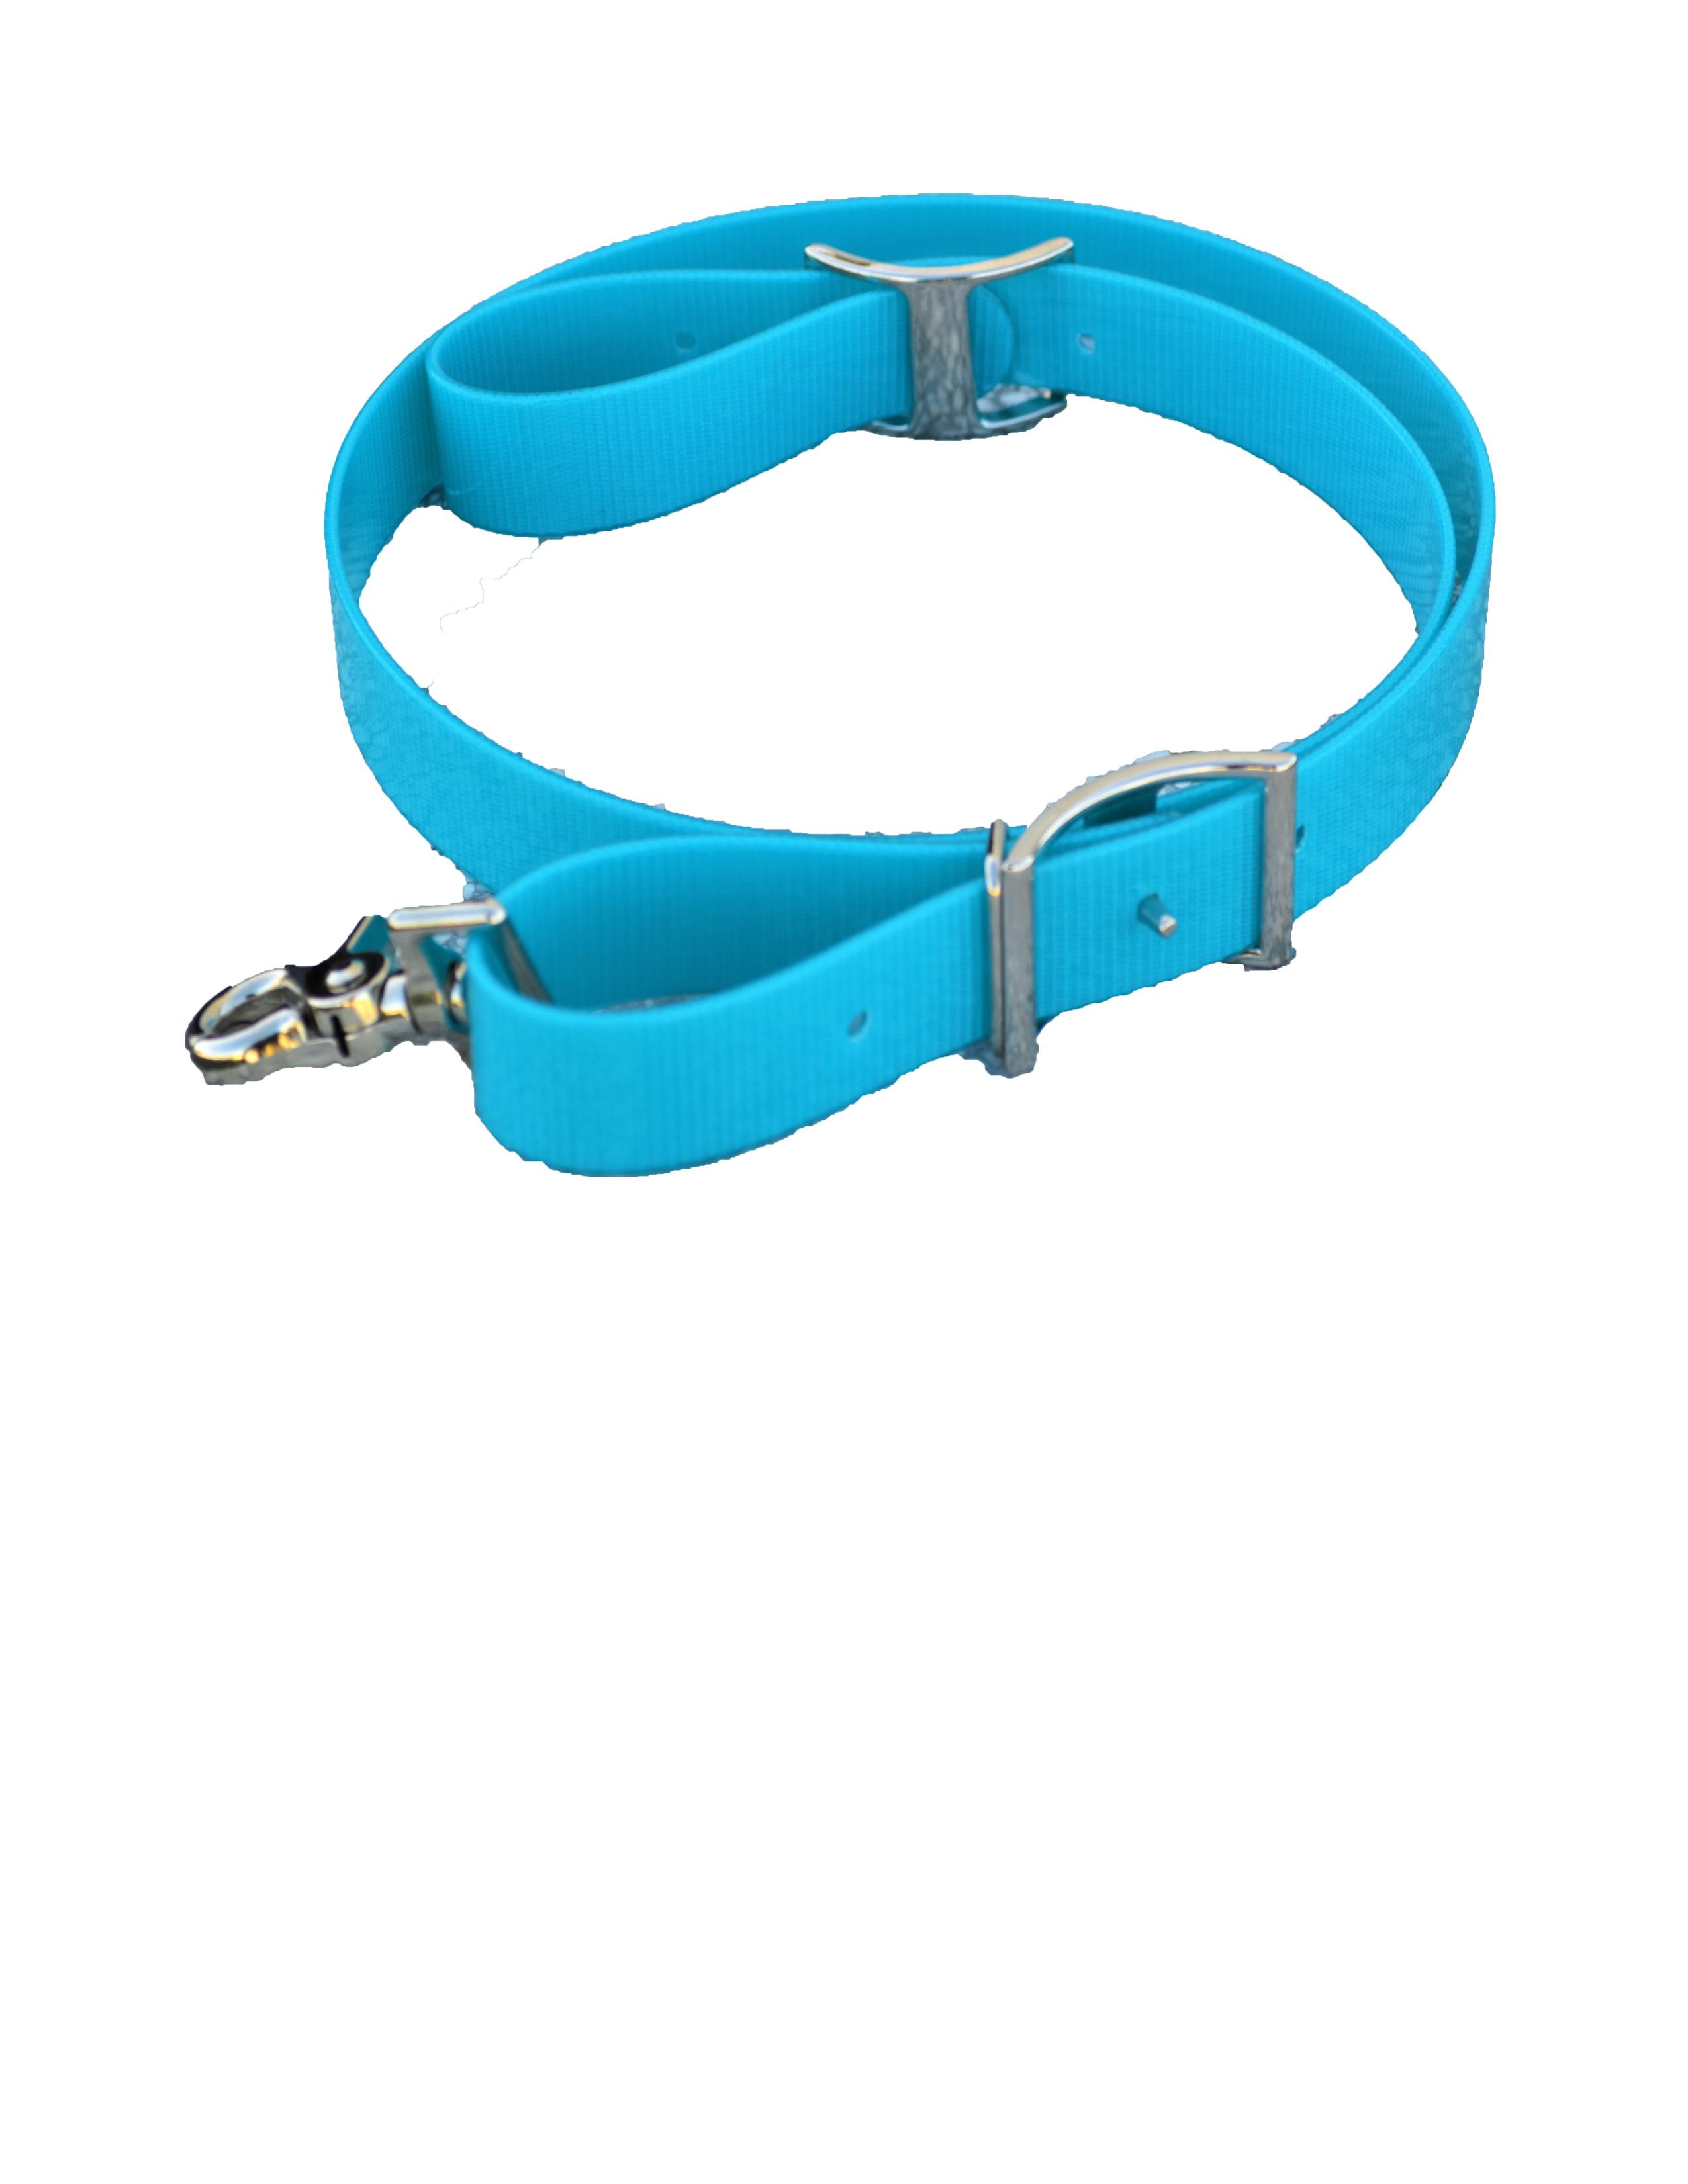 733-BIO-BLUE BIO Thane Tie Down Blue